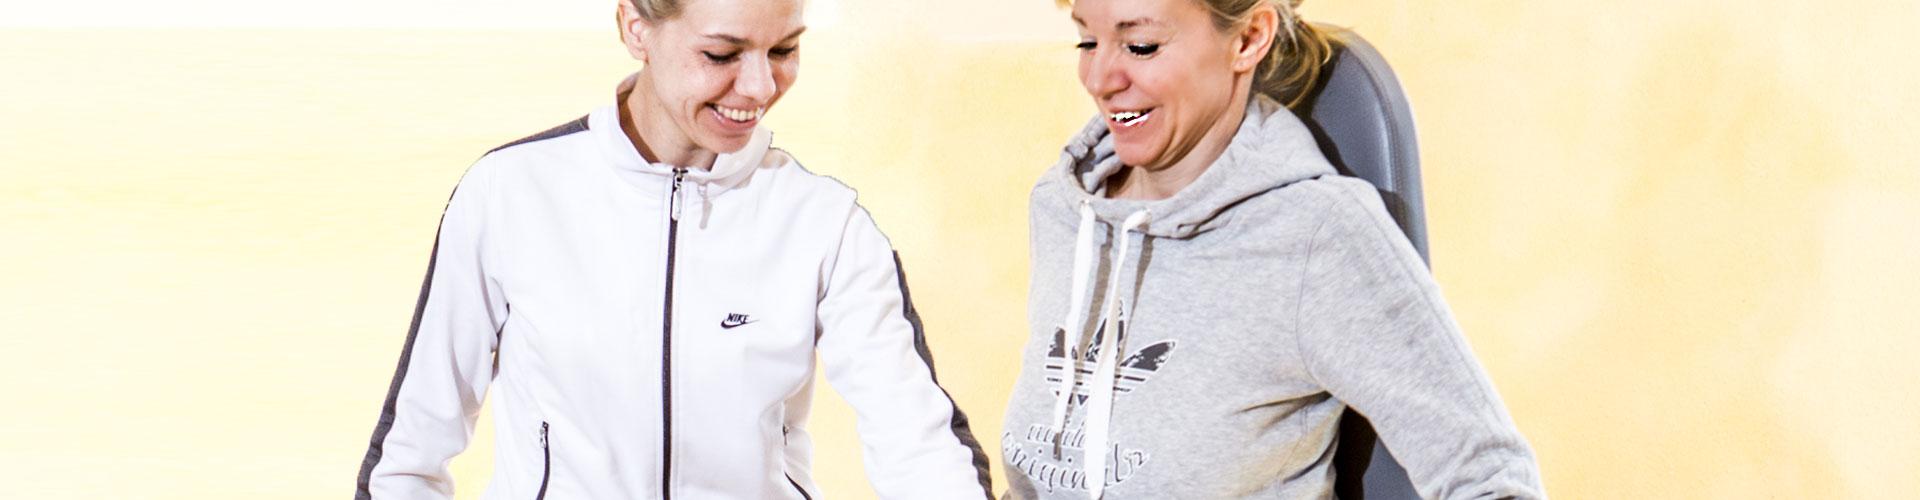 physiotherapie-sliderstandorte-purkersdorf